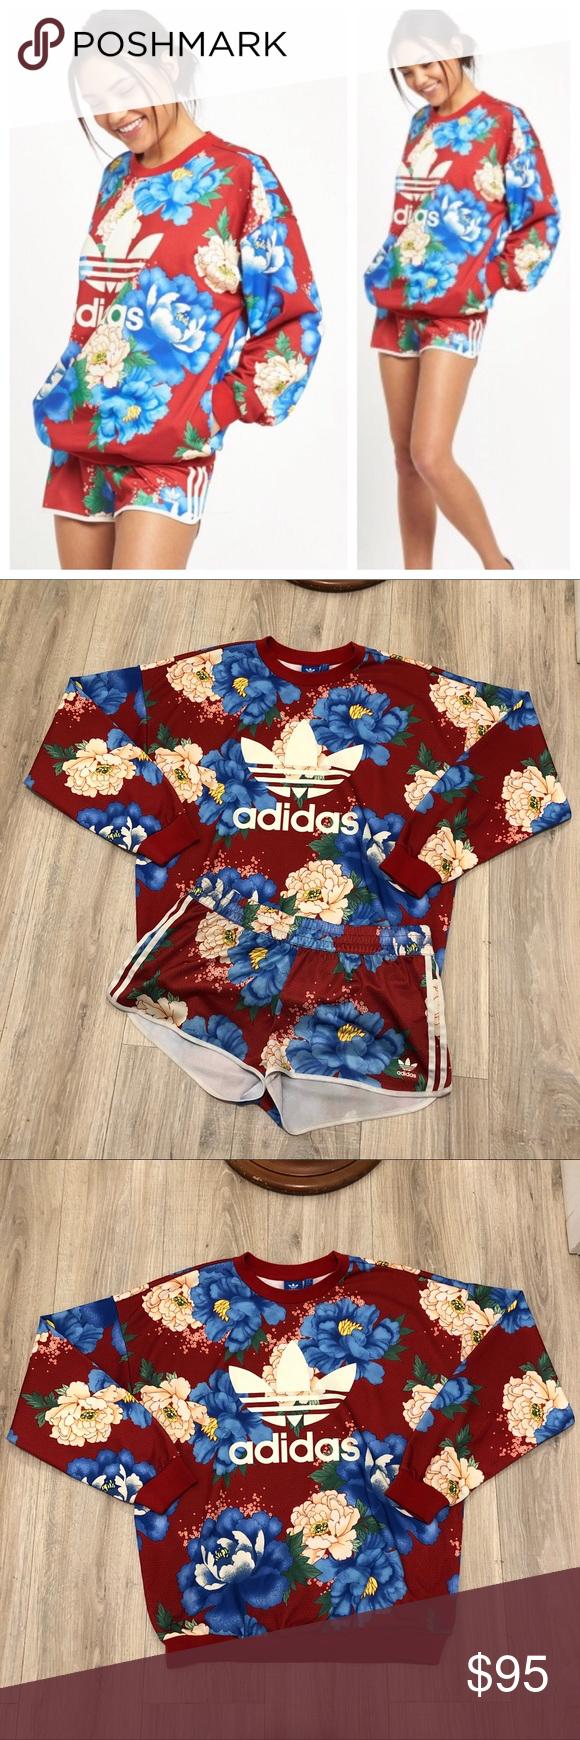 Sold Adidas Floral Clothes Design Short Sets [ 1740 x 580 Pixel ]